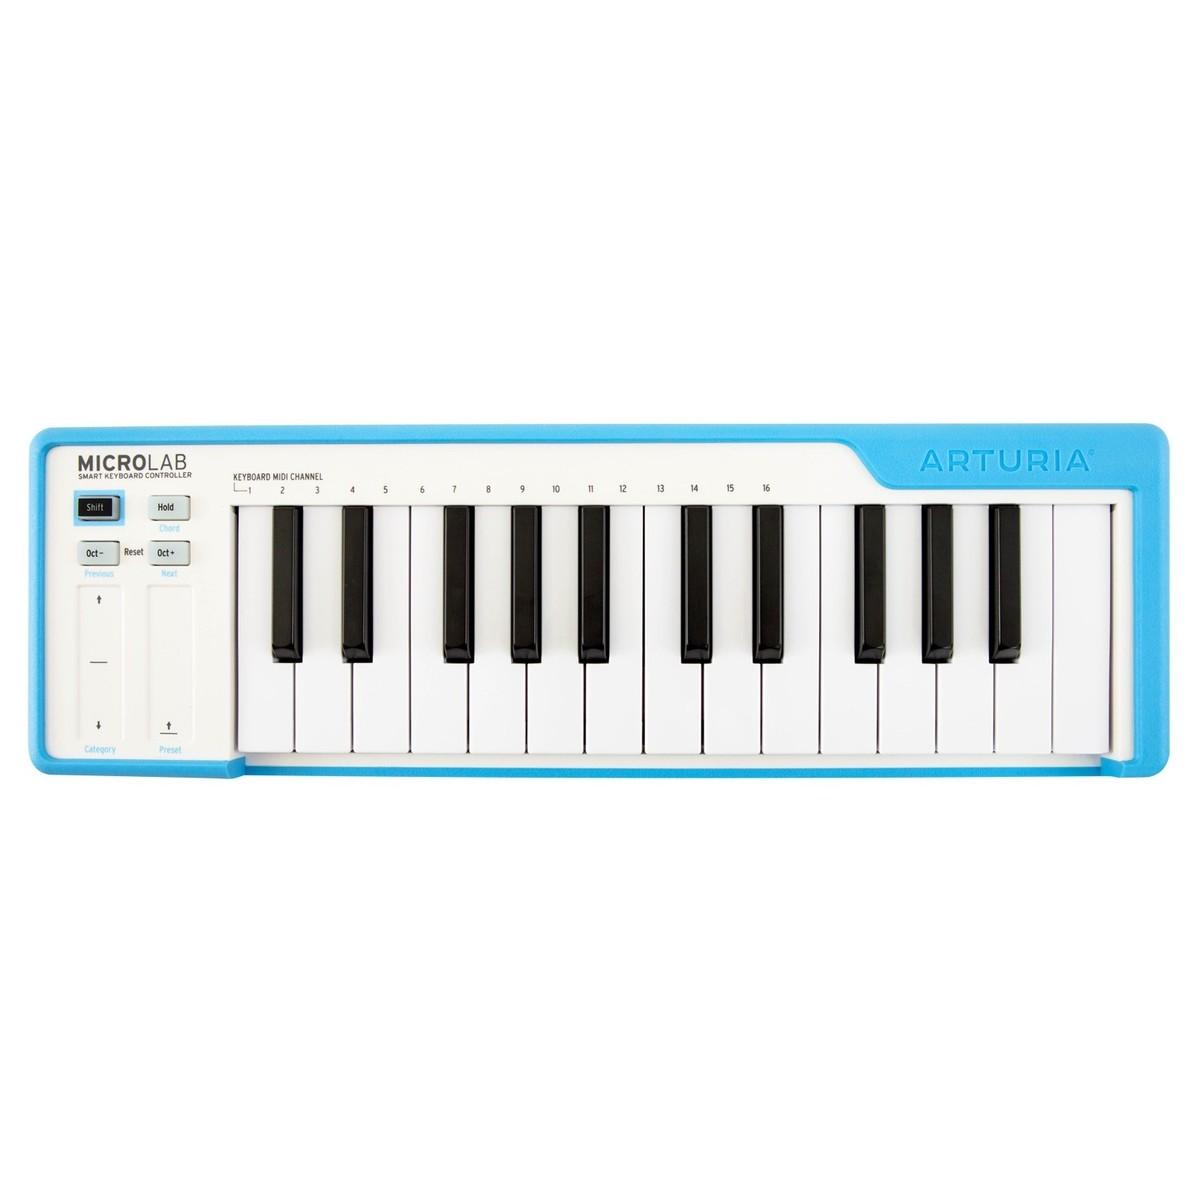 ARTURIA MICROLAB BLUE CONTROLLER TASTIERA 25 TASTI MINI MIDI - USB COLORE BLU